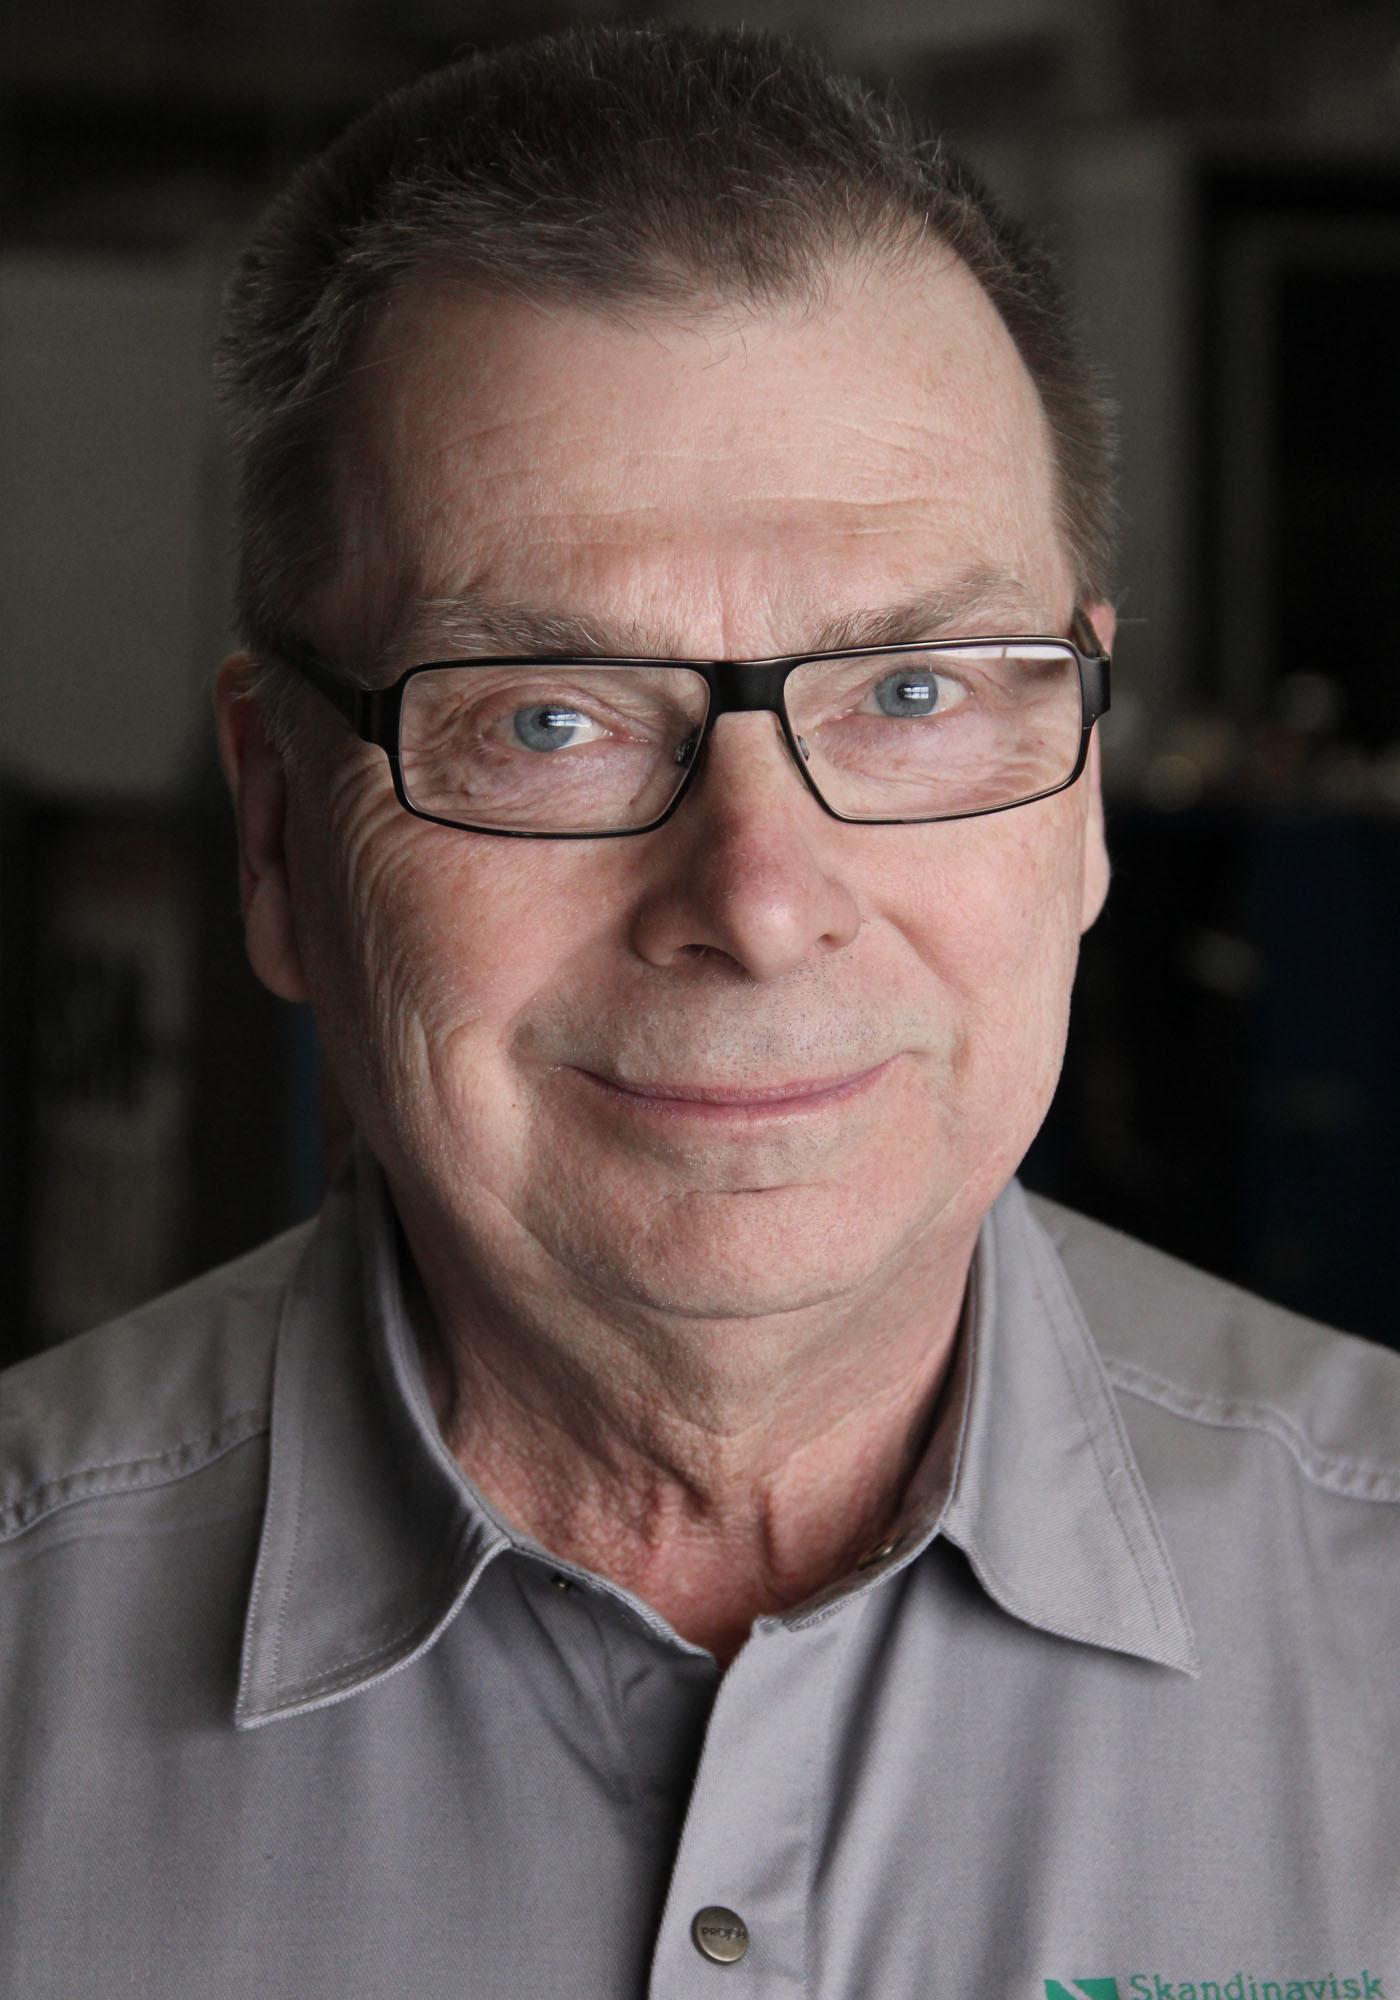 Ingvar Persson